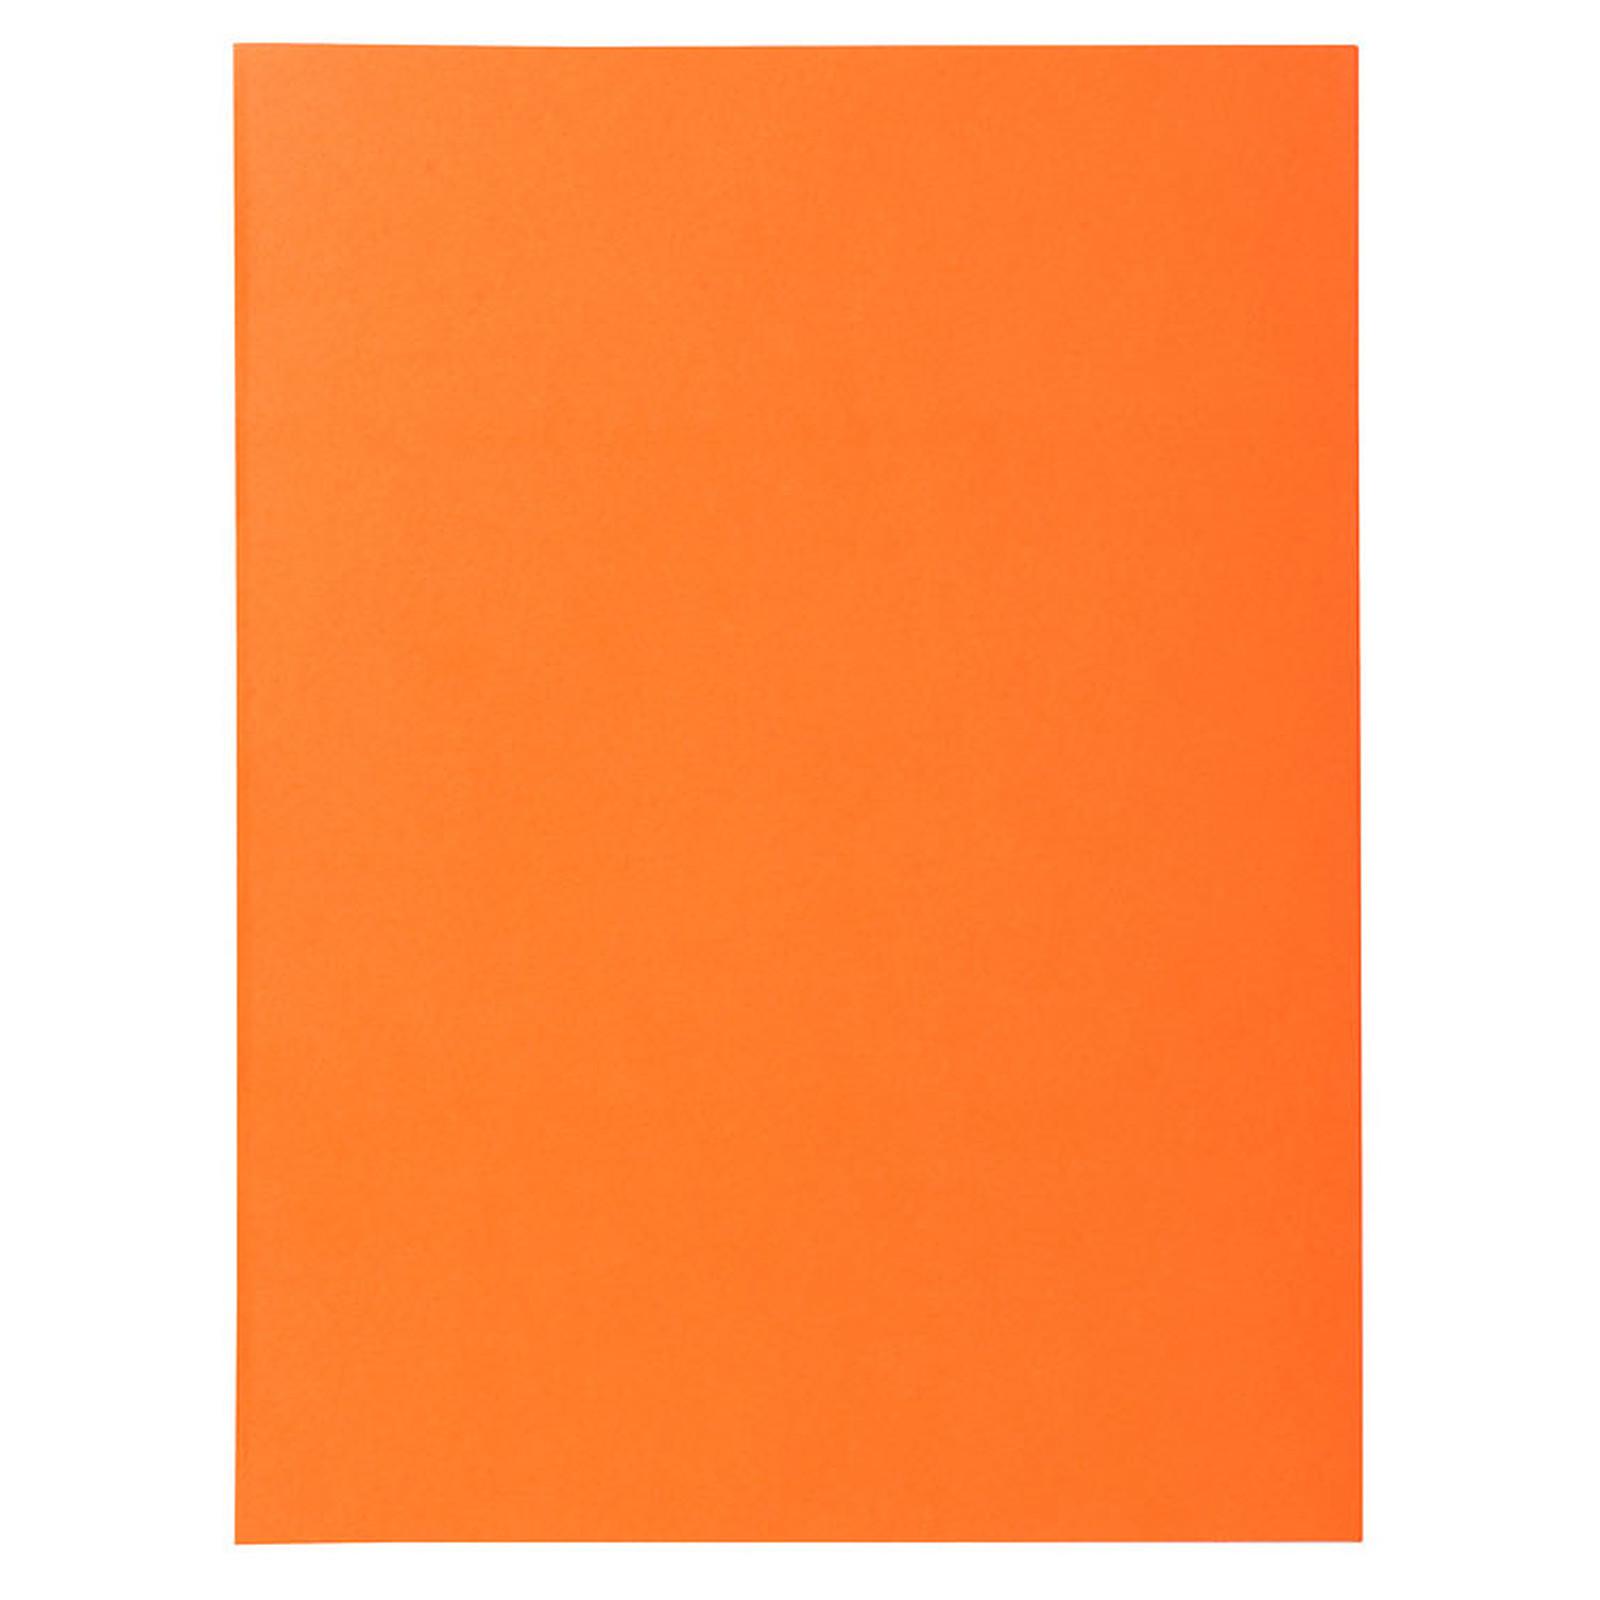 Exacompta Chemises Super Orange x 100